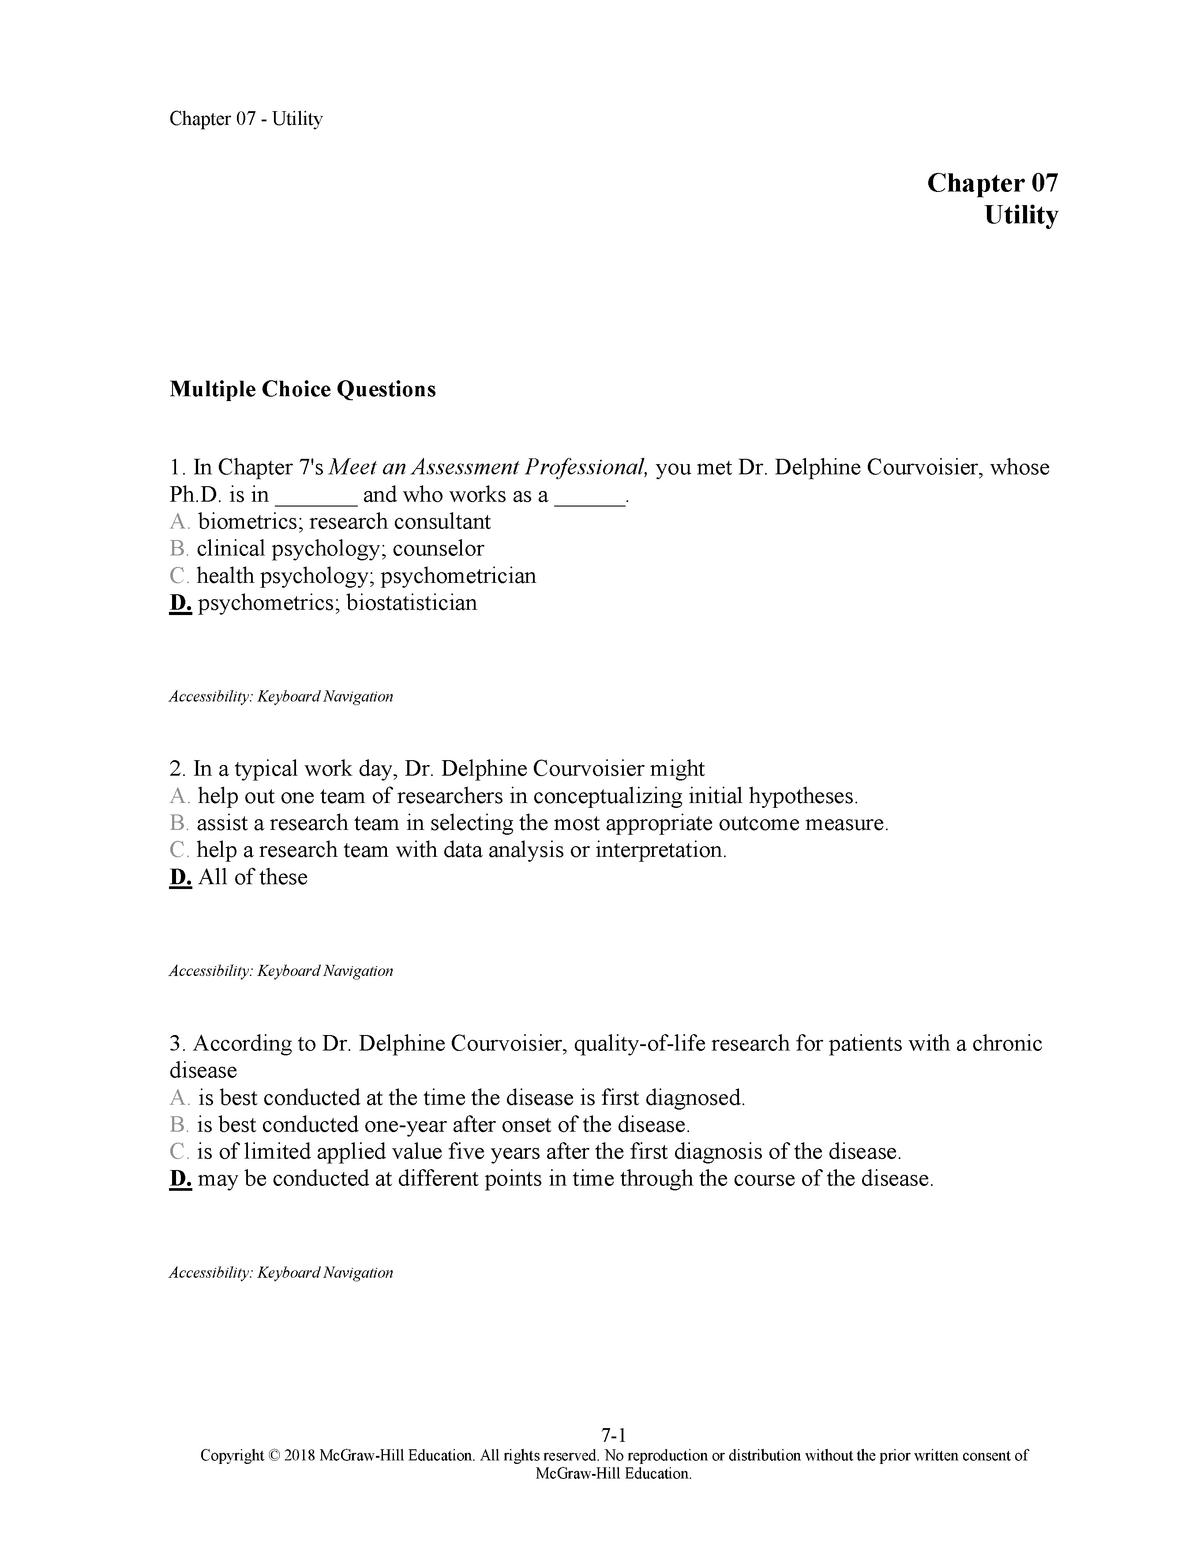 Chap007 Testbank - PSY1022: Psychology 1B - StuDocu